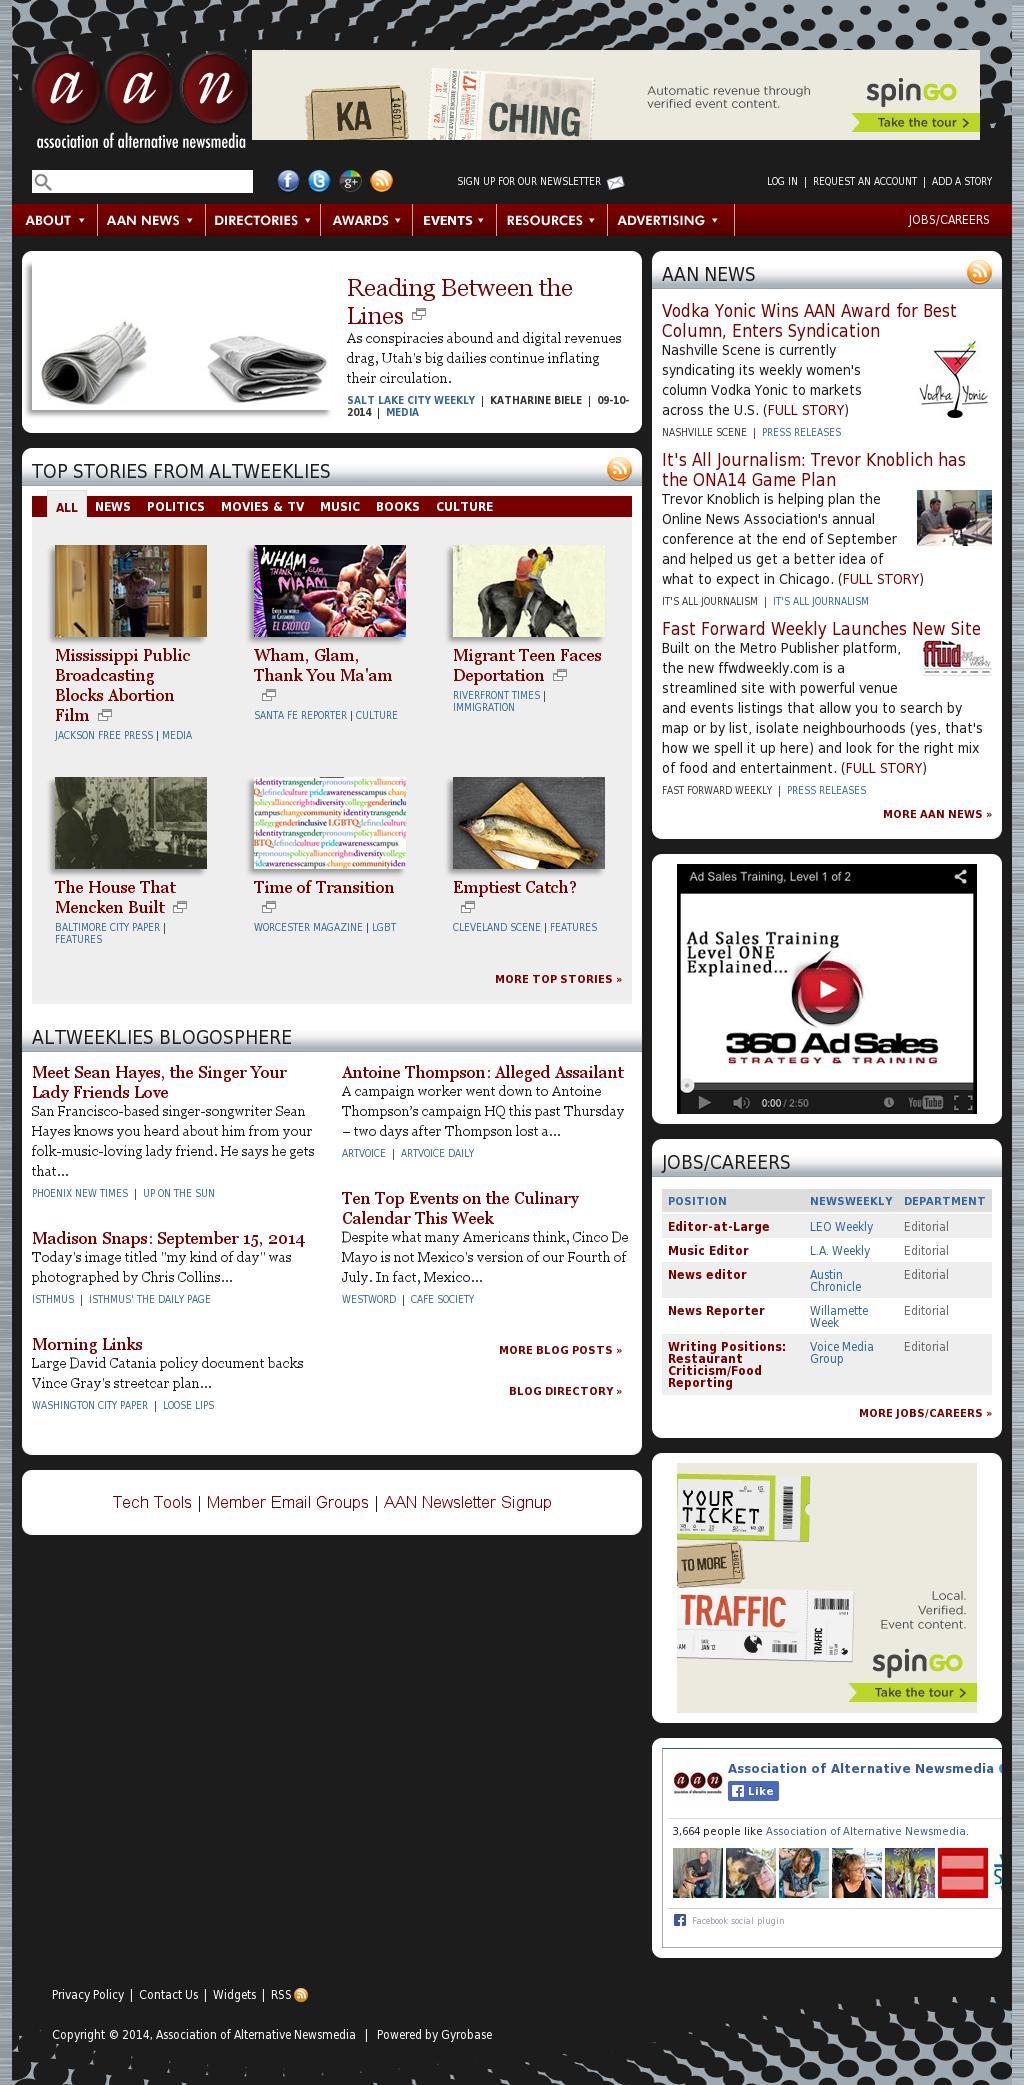 Association of Alternative Newsmedia at Monday Sept. 15, 2014, 4 p.m. UTC